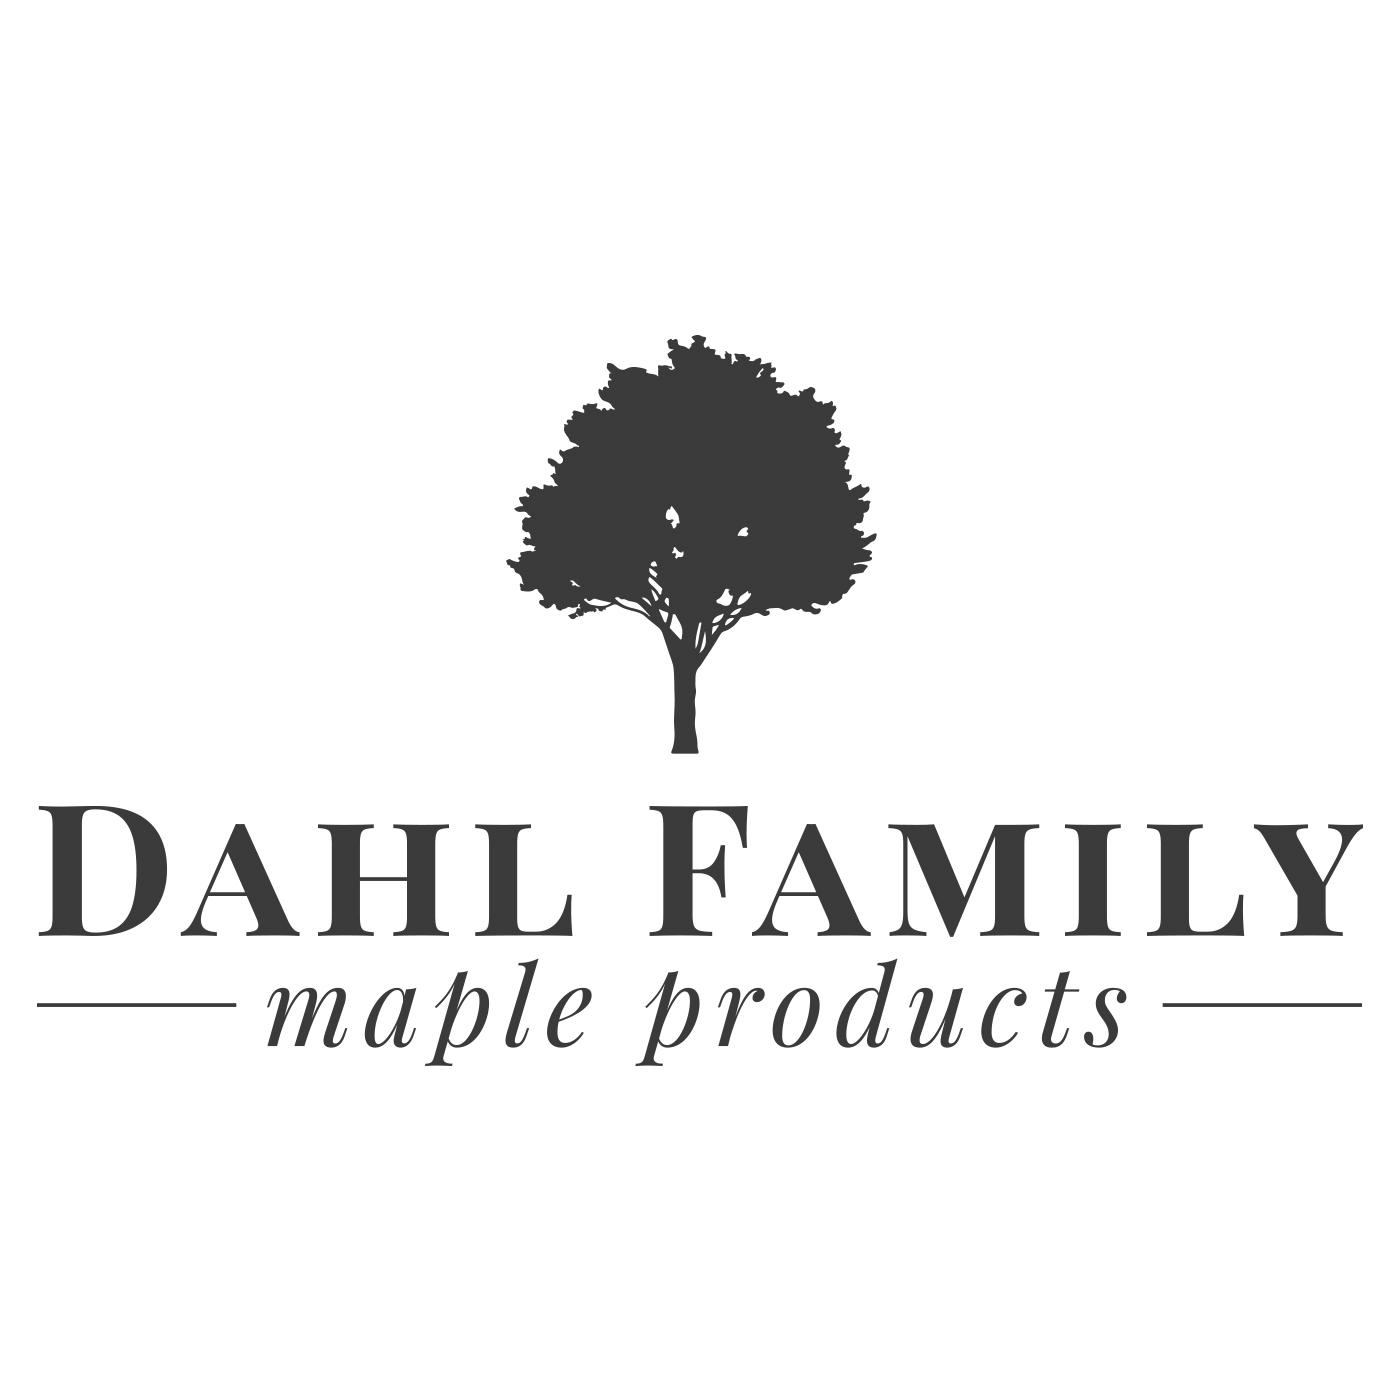 dahl_logo_bw.jpg